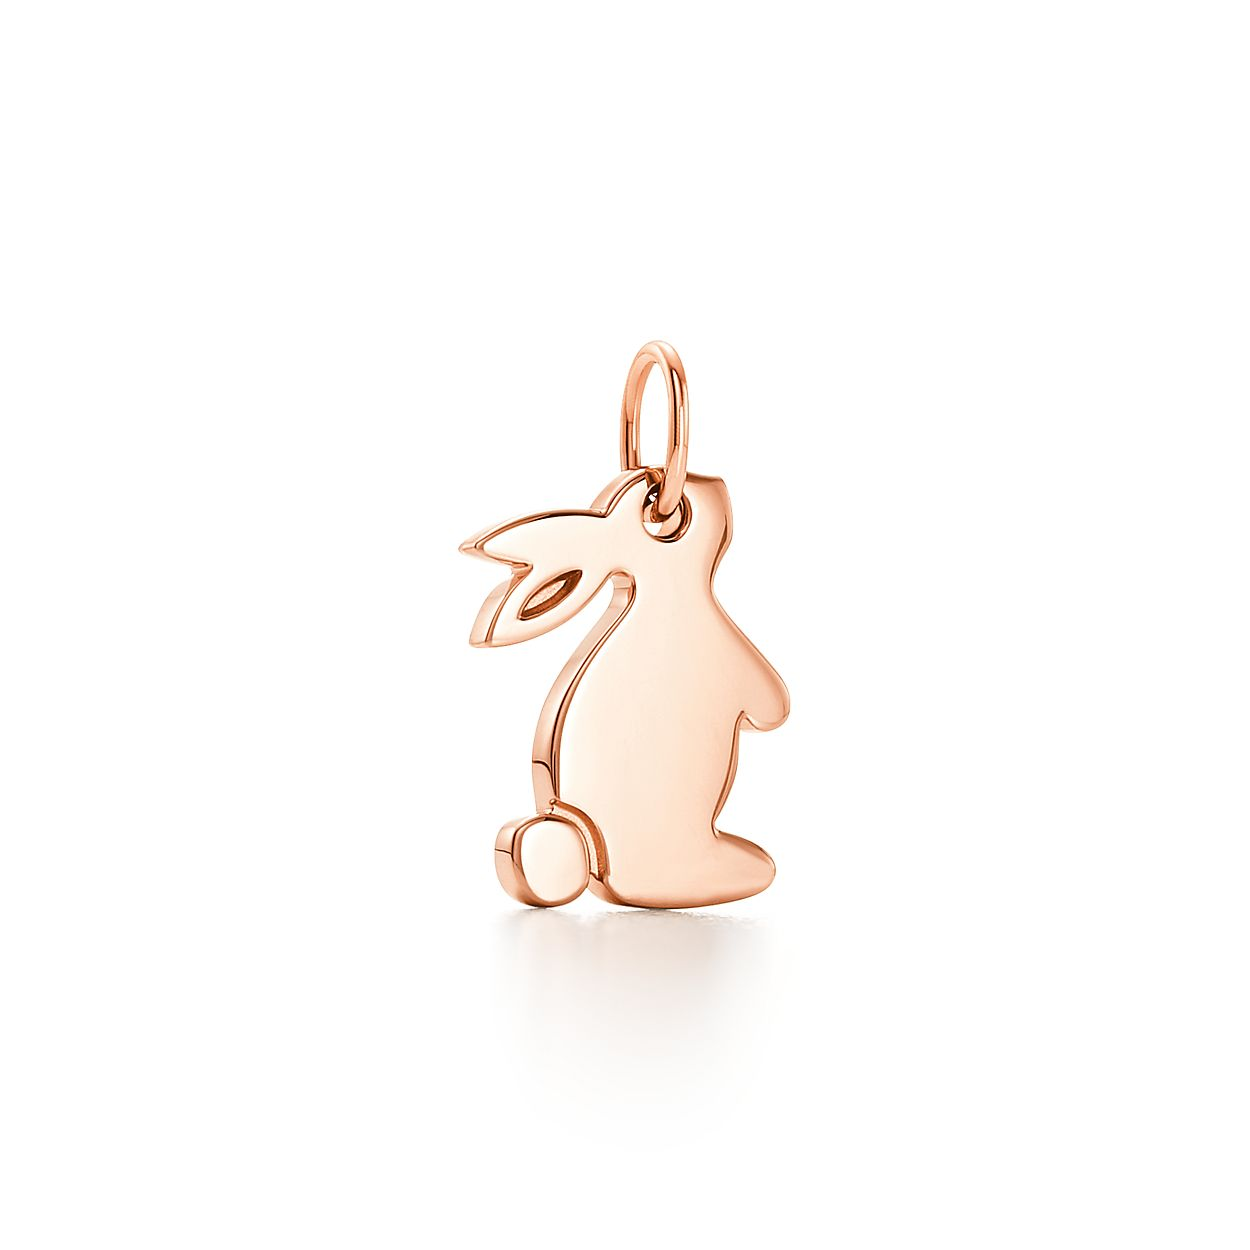 Tiffany Charms snuggle bunny charm in 18k gold Tiffany & Co. O5zms0